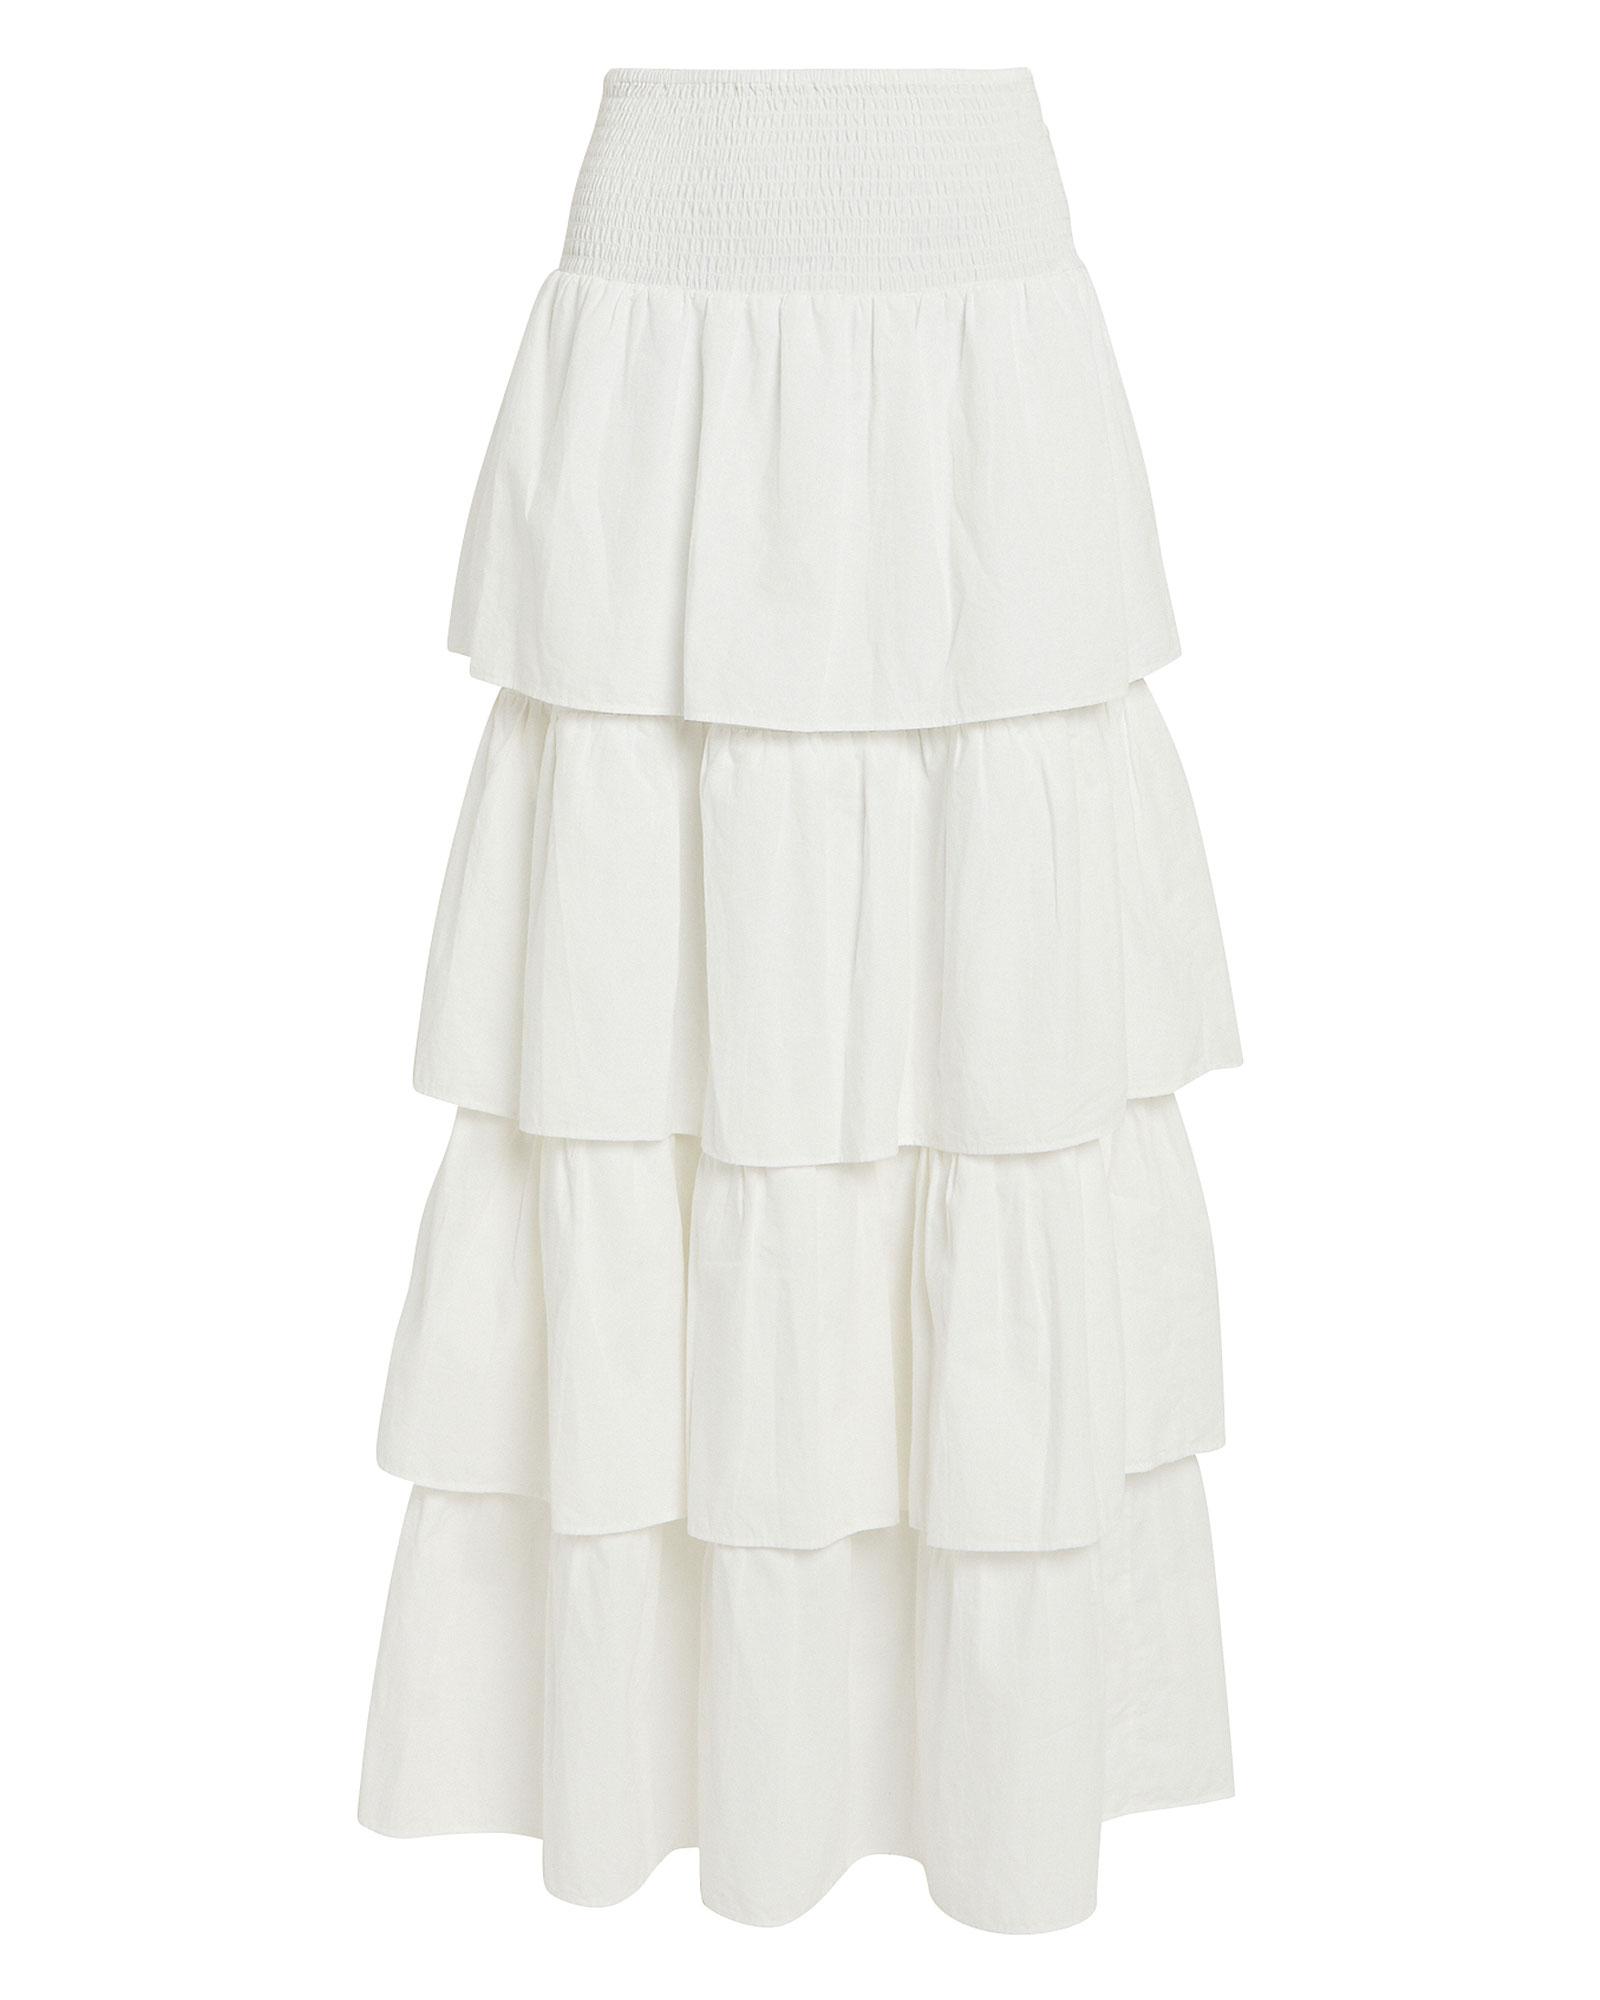 Weworewhat Skirts WEWOREWHAT PALOMA COTTON MAXI SKIRT